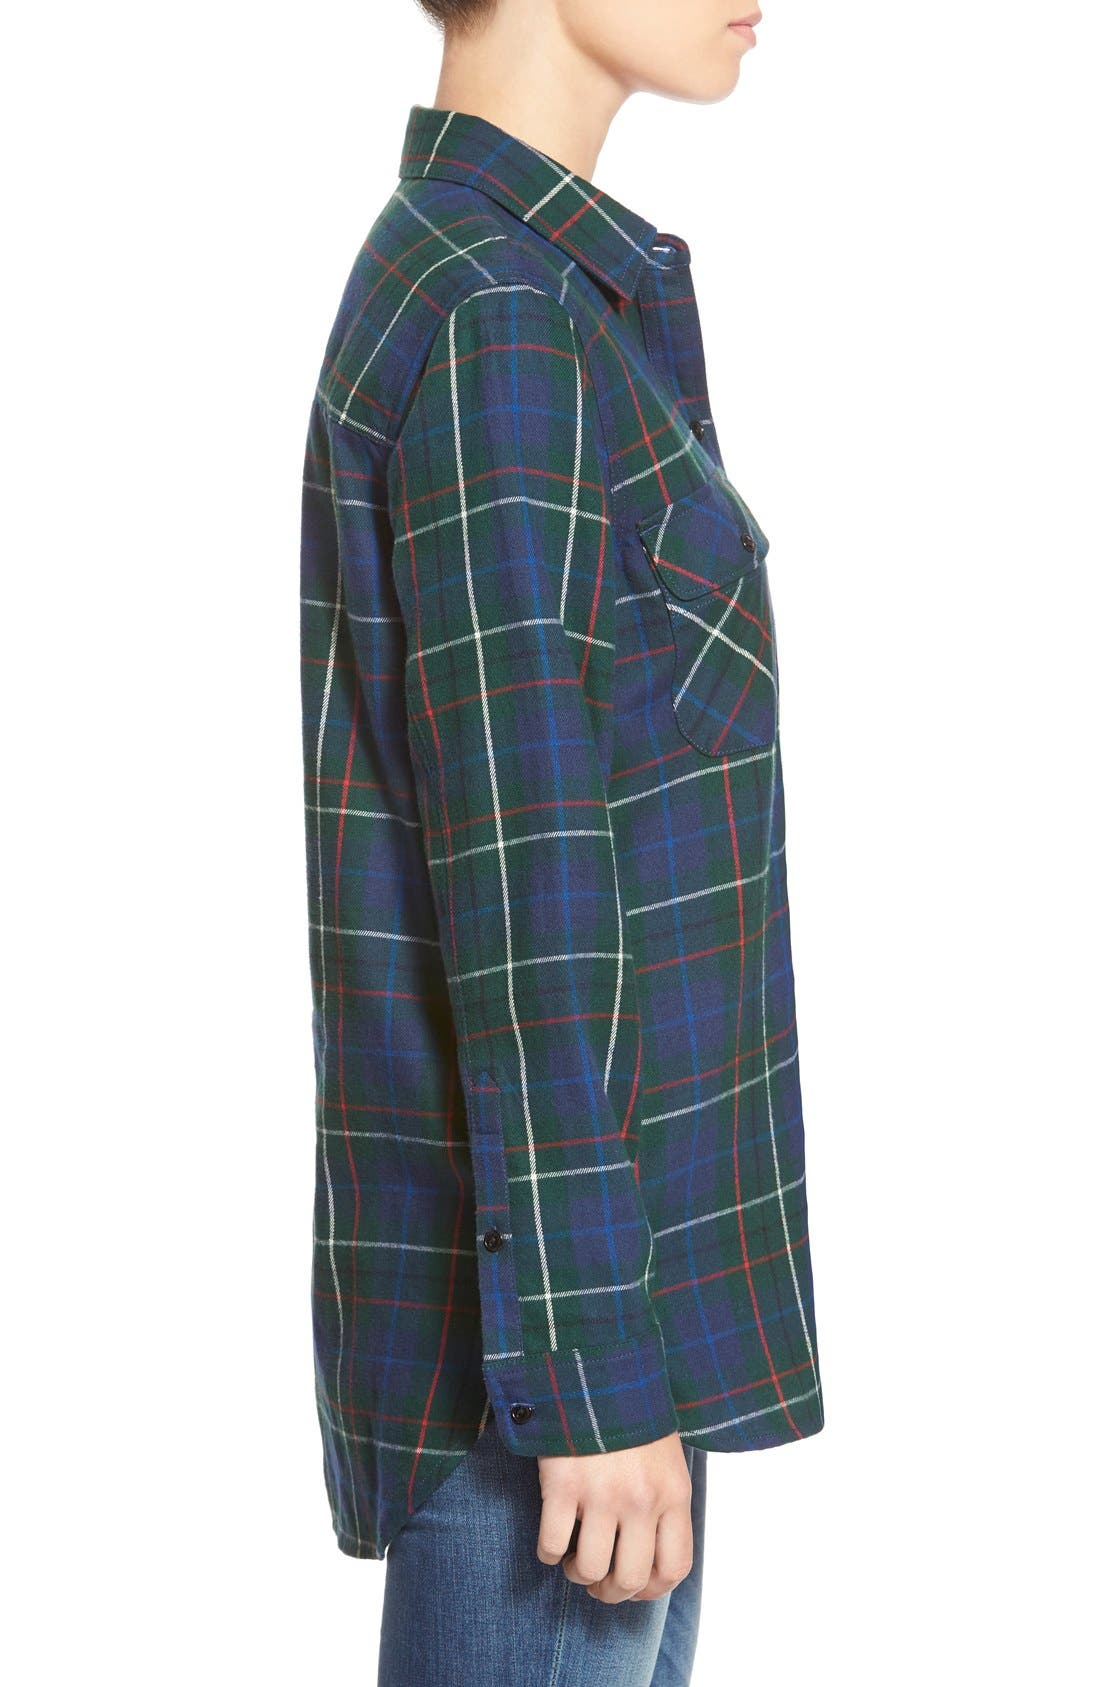 Ex Boyfriend - Ontario Plaid Flannel Shirt,                             Alternate thumbnail 3, color,                             300